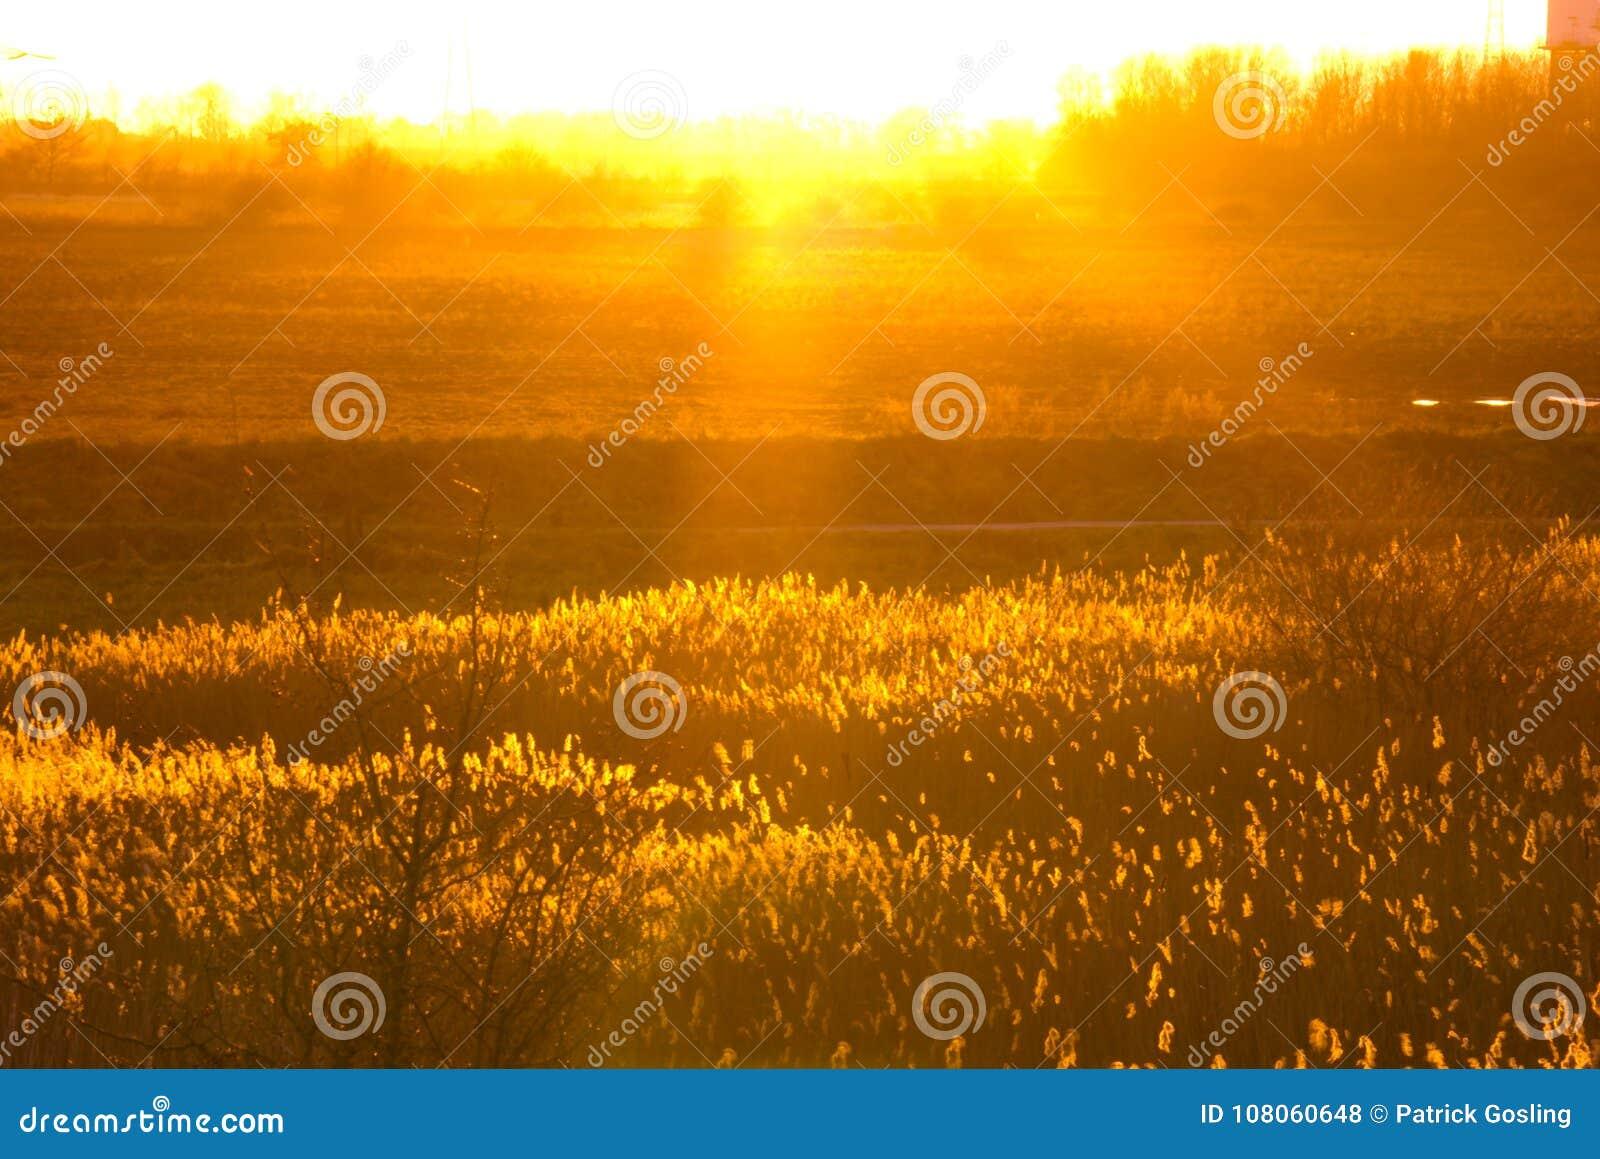 Goldene Farben der Abendsonne